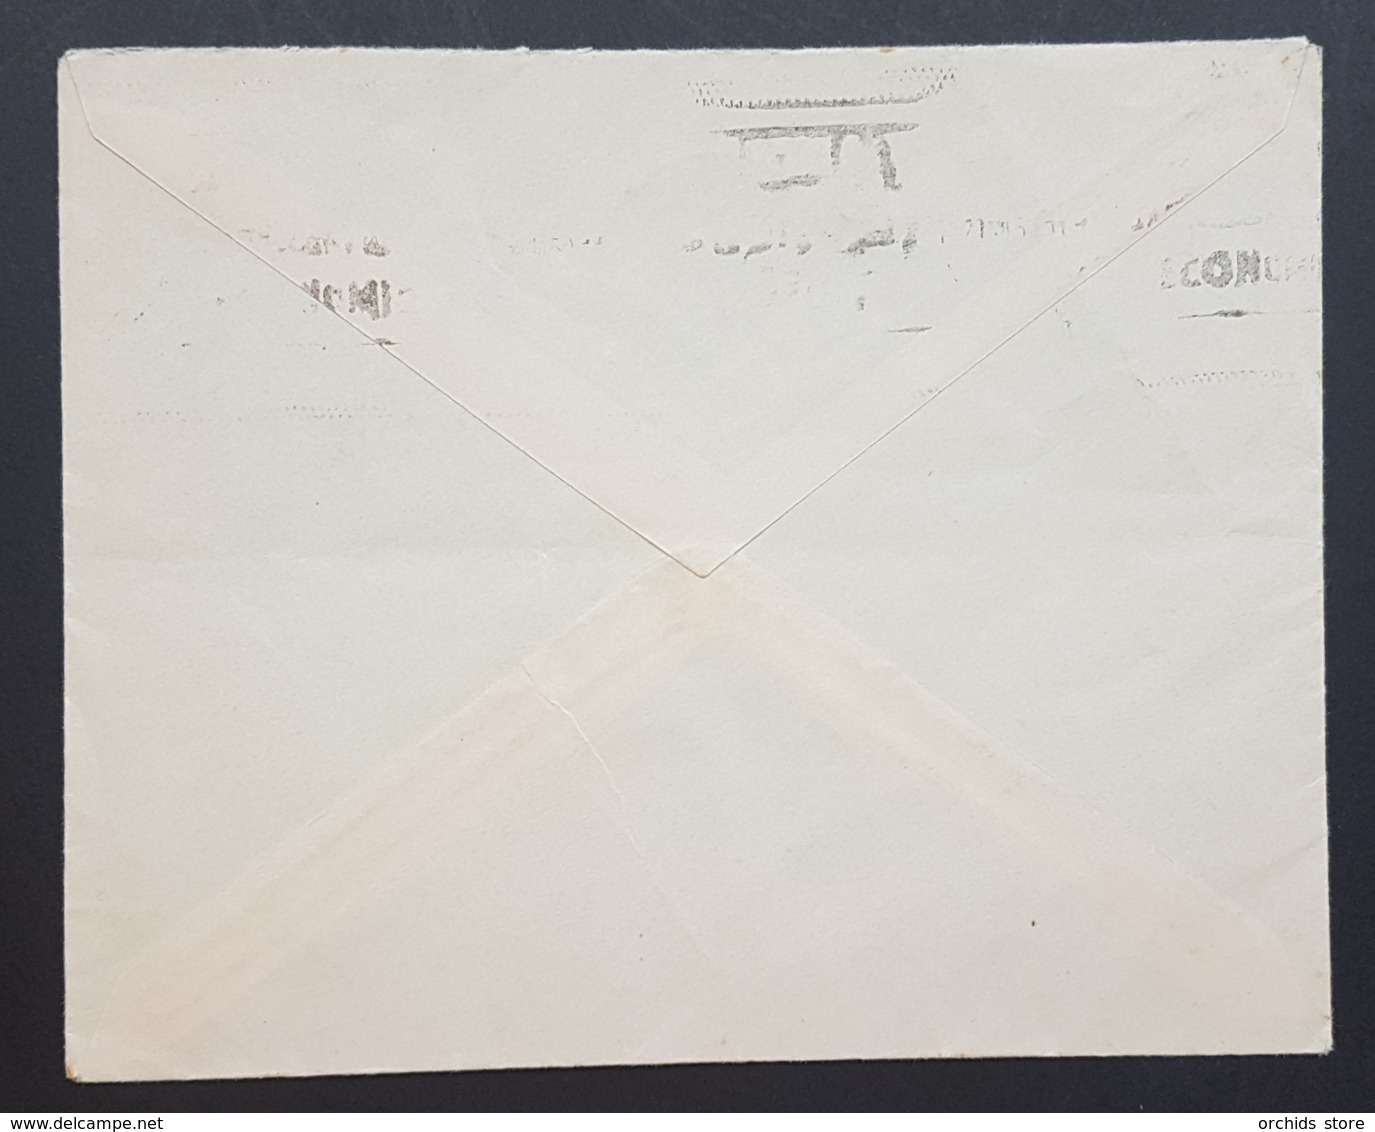 XZ37 Lebanon 1950 Cover Sent From BHAMDOUNE GARE To The AUB - Lebanon